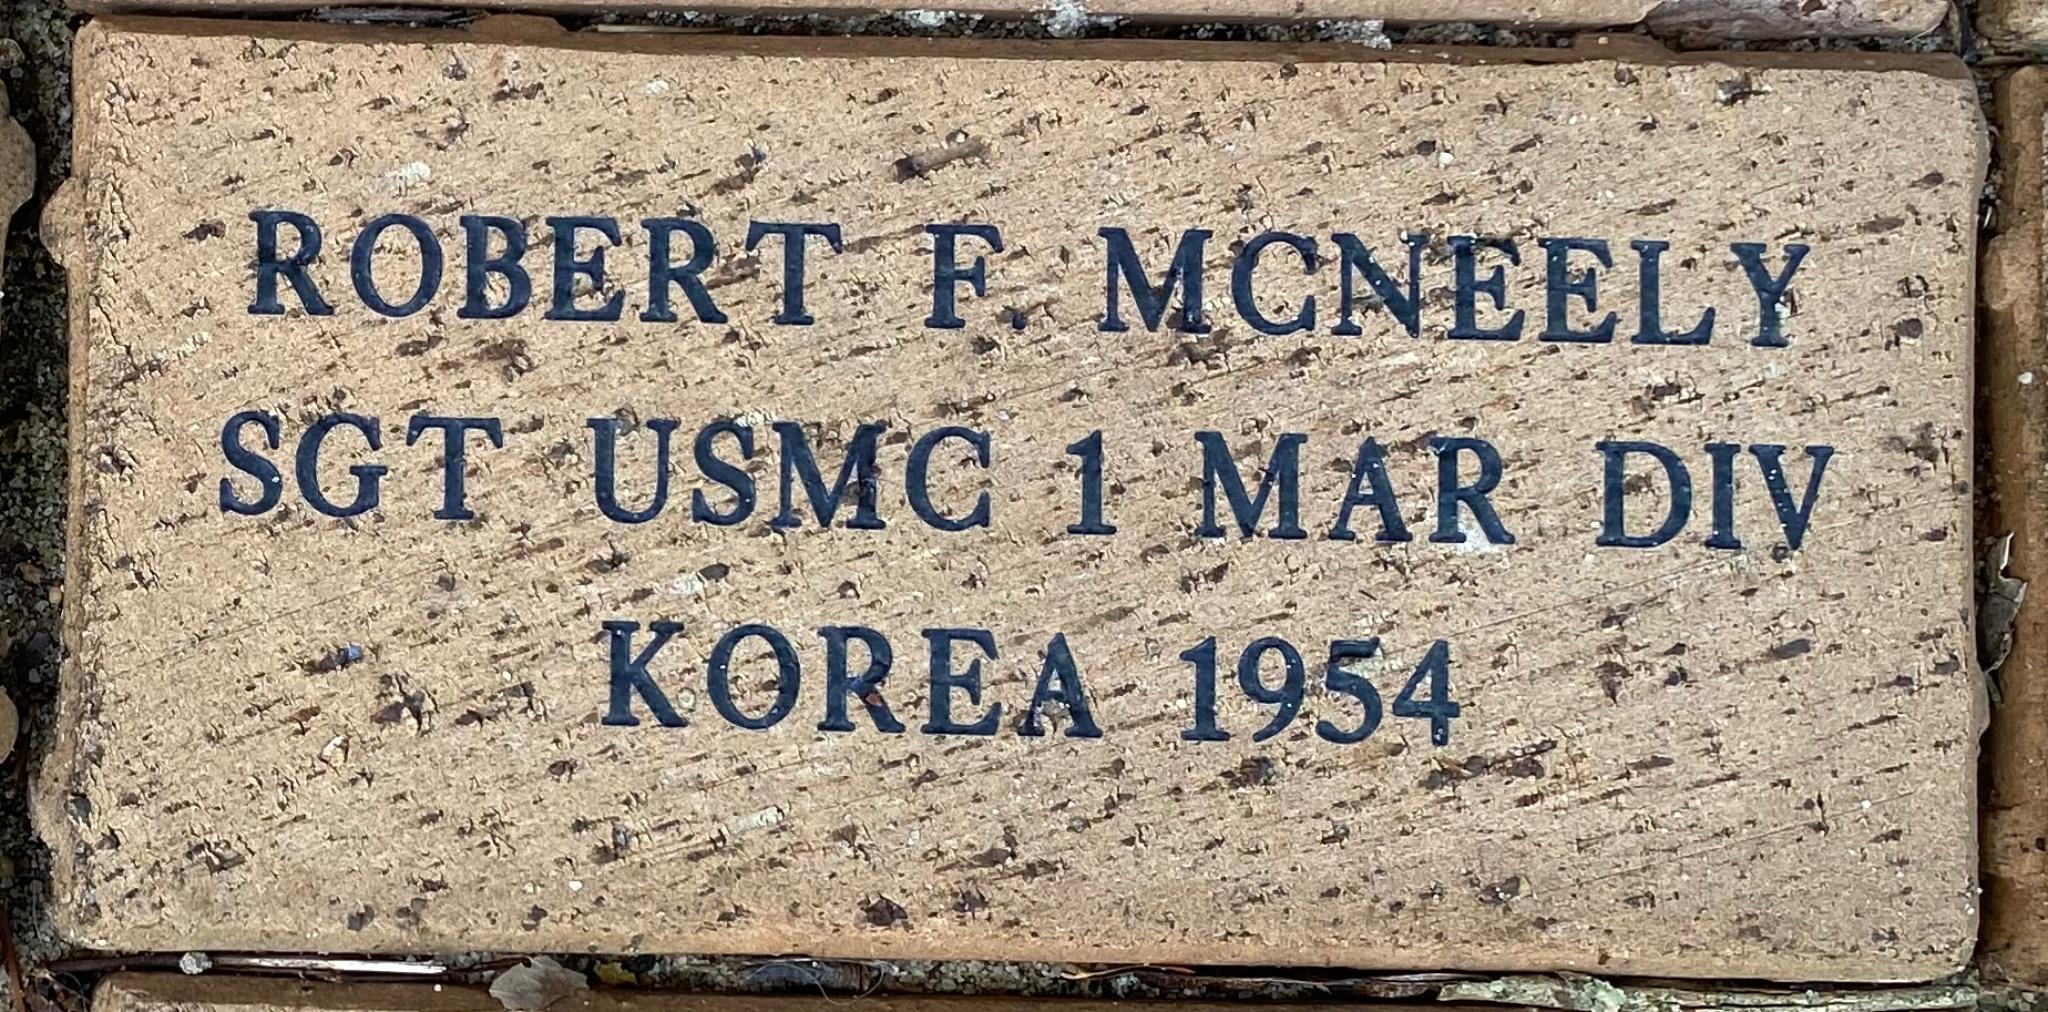 ROBERT F. MCNEELY SGT USMC 1 MAR DIV KOREA 1954